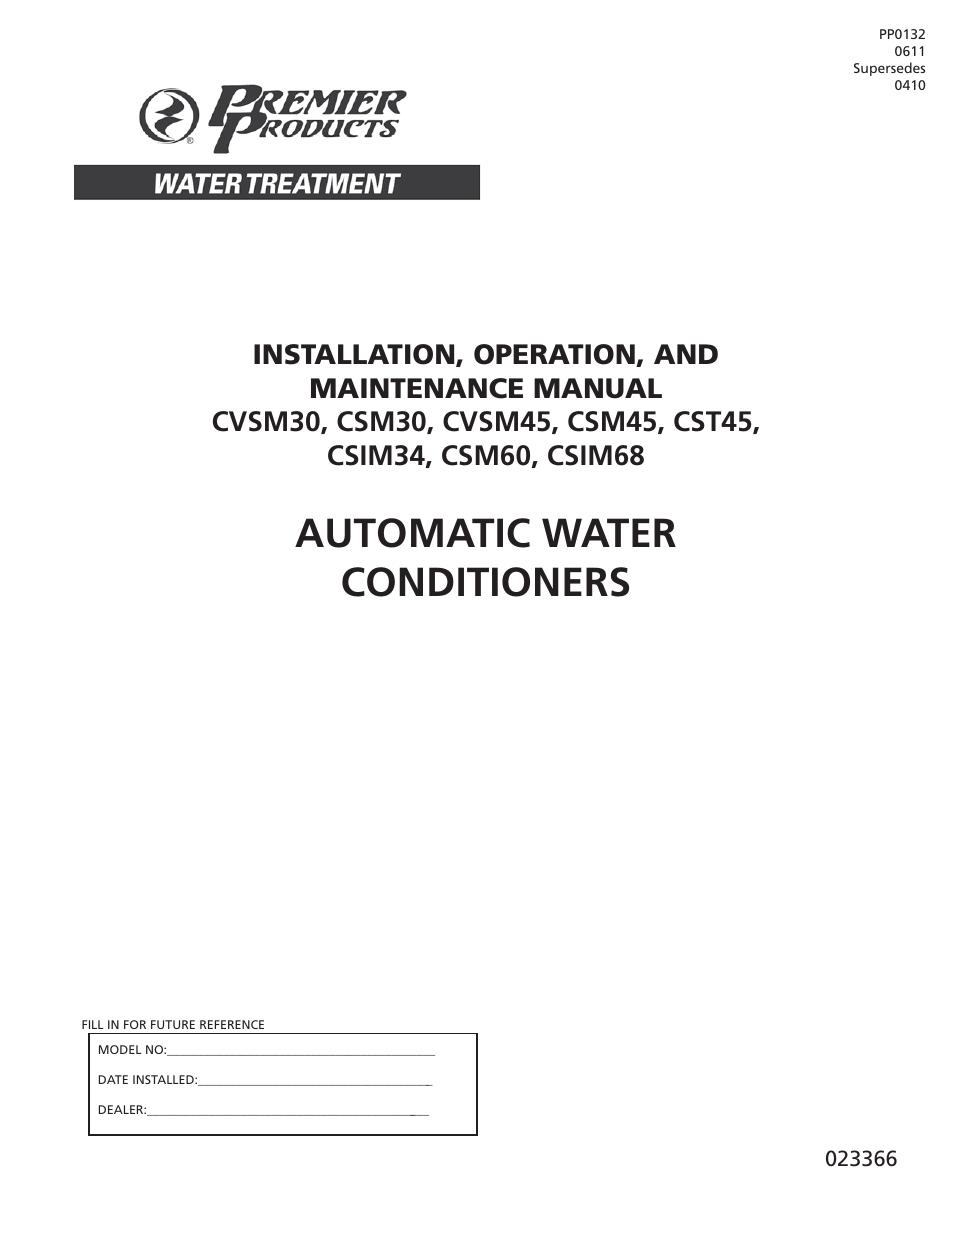 Flint Amp Walling Csm Cvsm Two Tank Water Softeners User